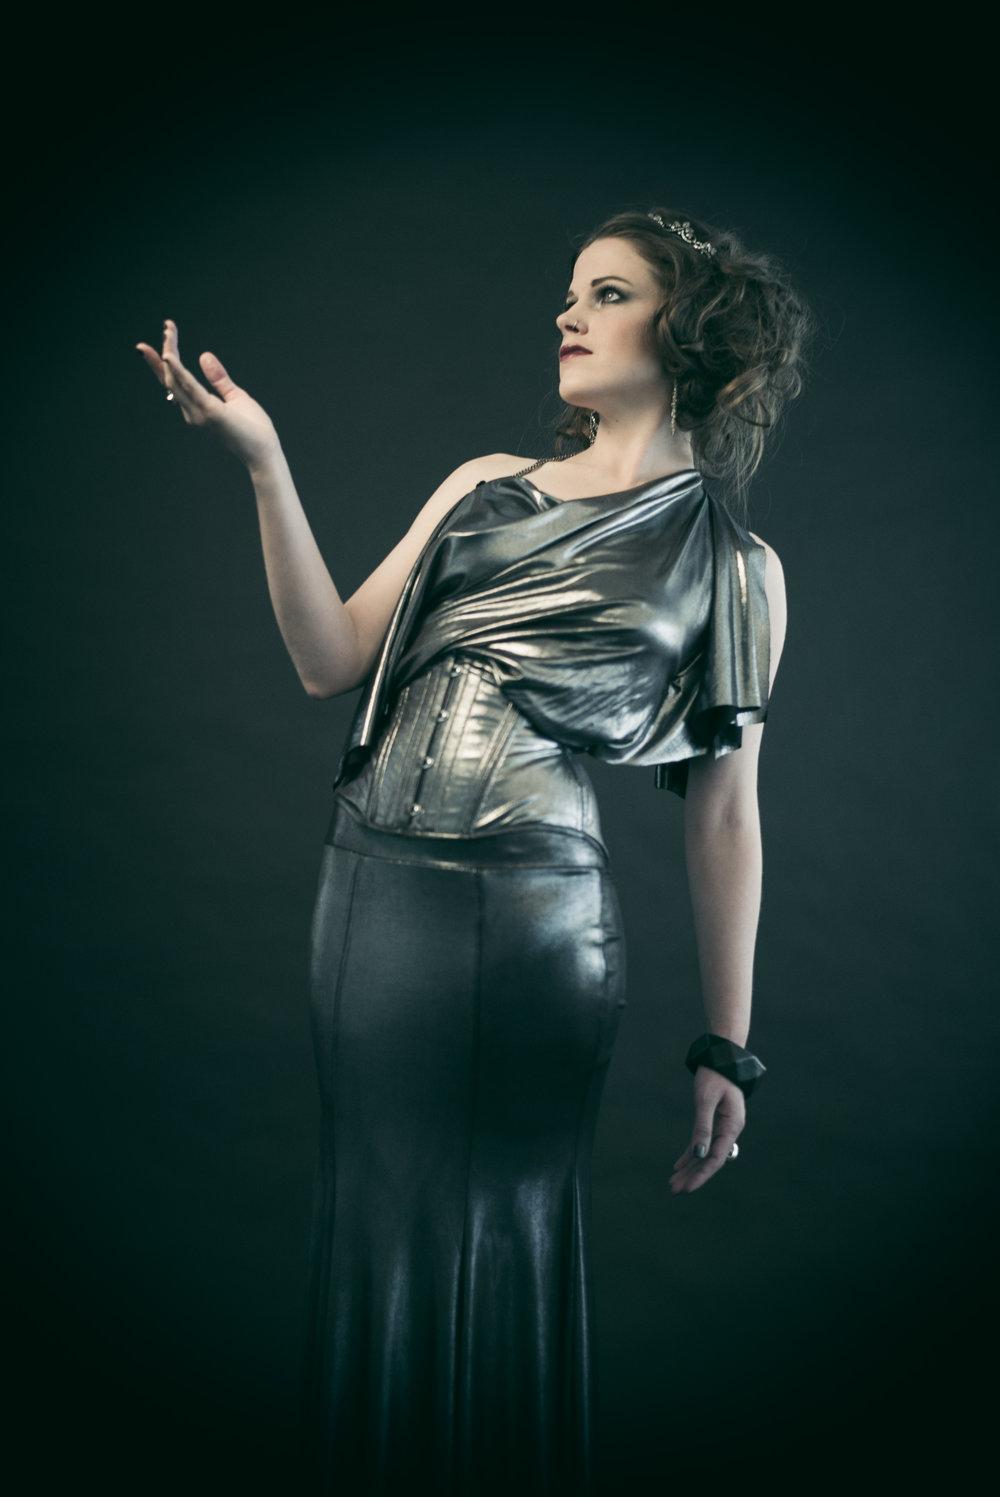 Dollymop for Dark Garden   Couture  ensemble | Model: Euphrates X | Photo © Joel Aron